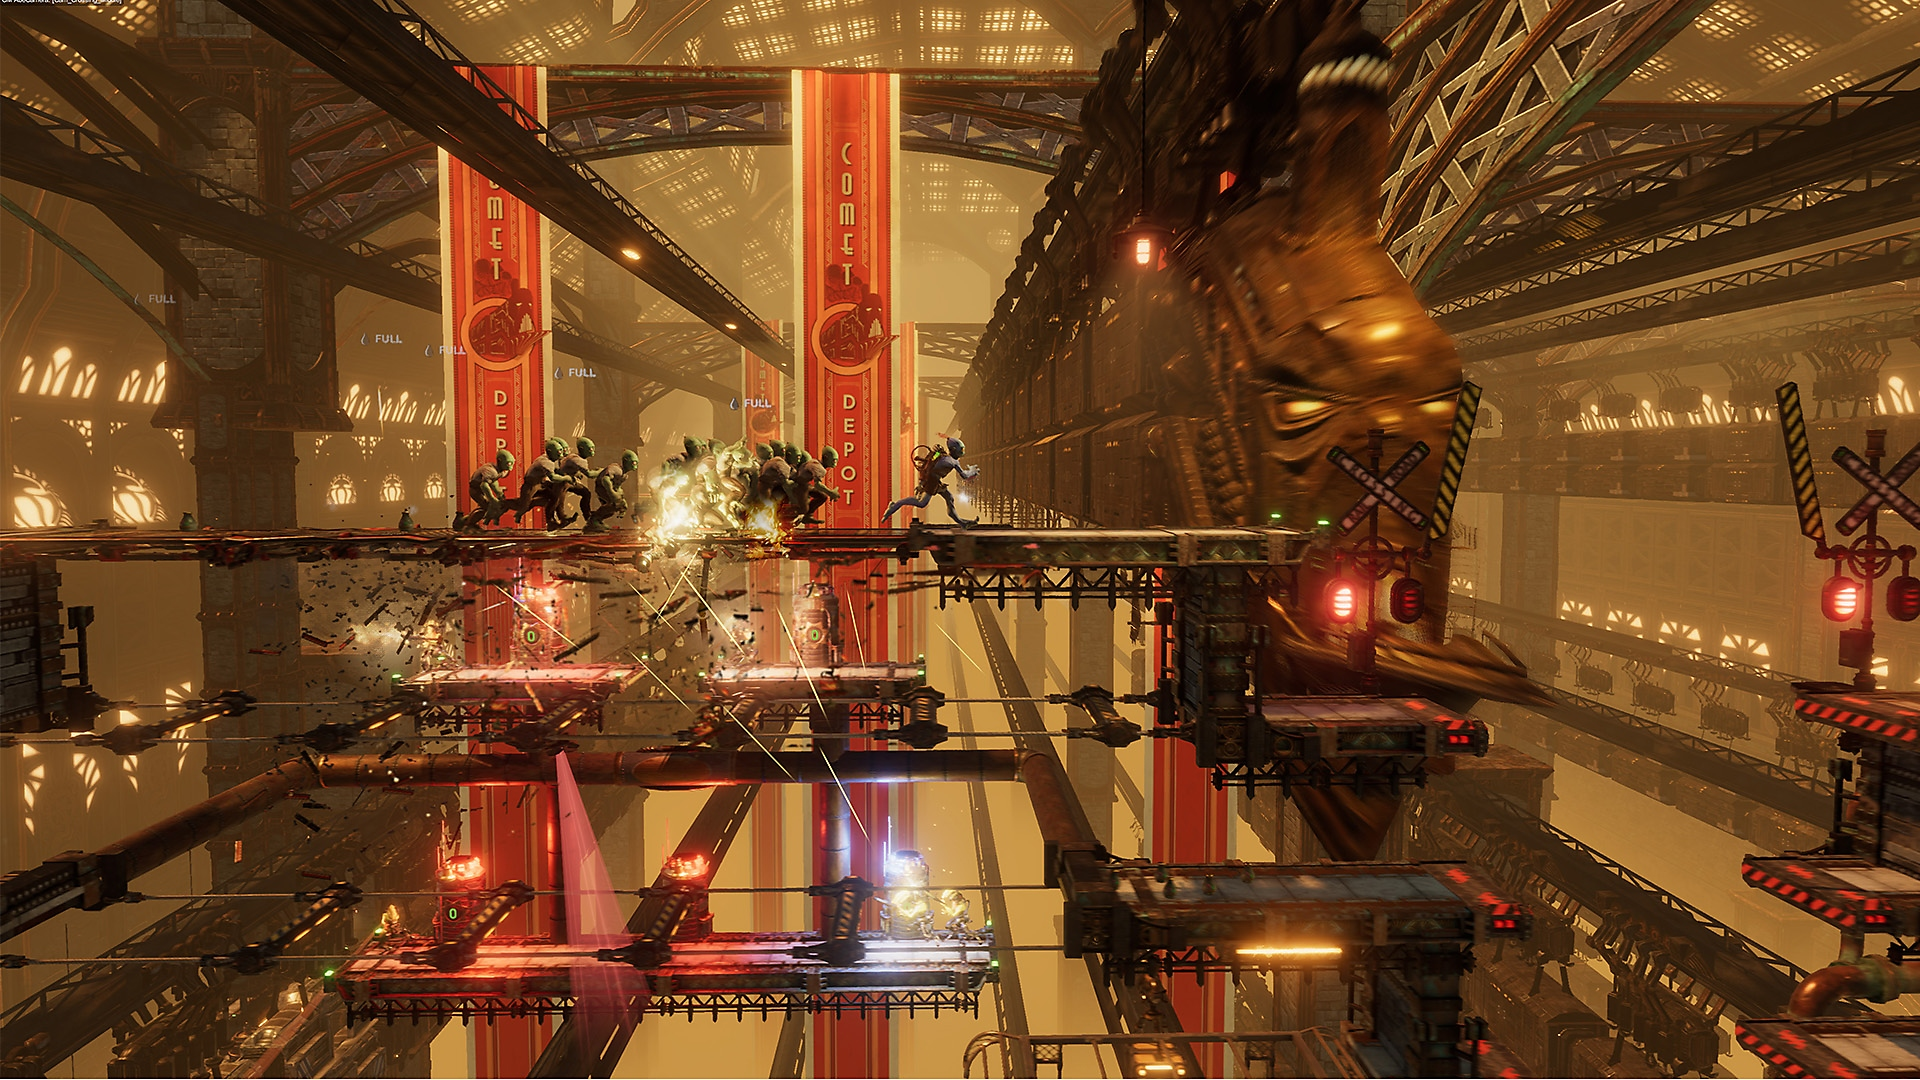 Oddworld Soulstorm - ภาพหน้าจอเปิดตัว